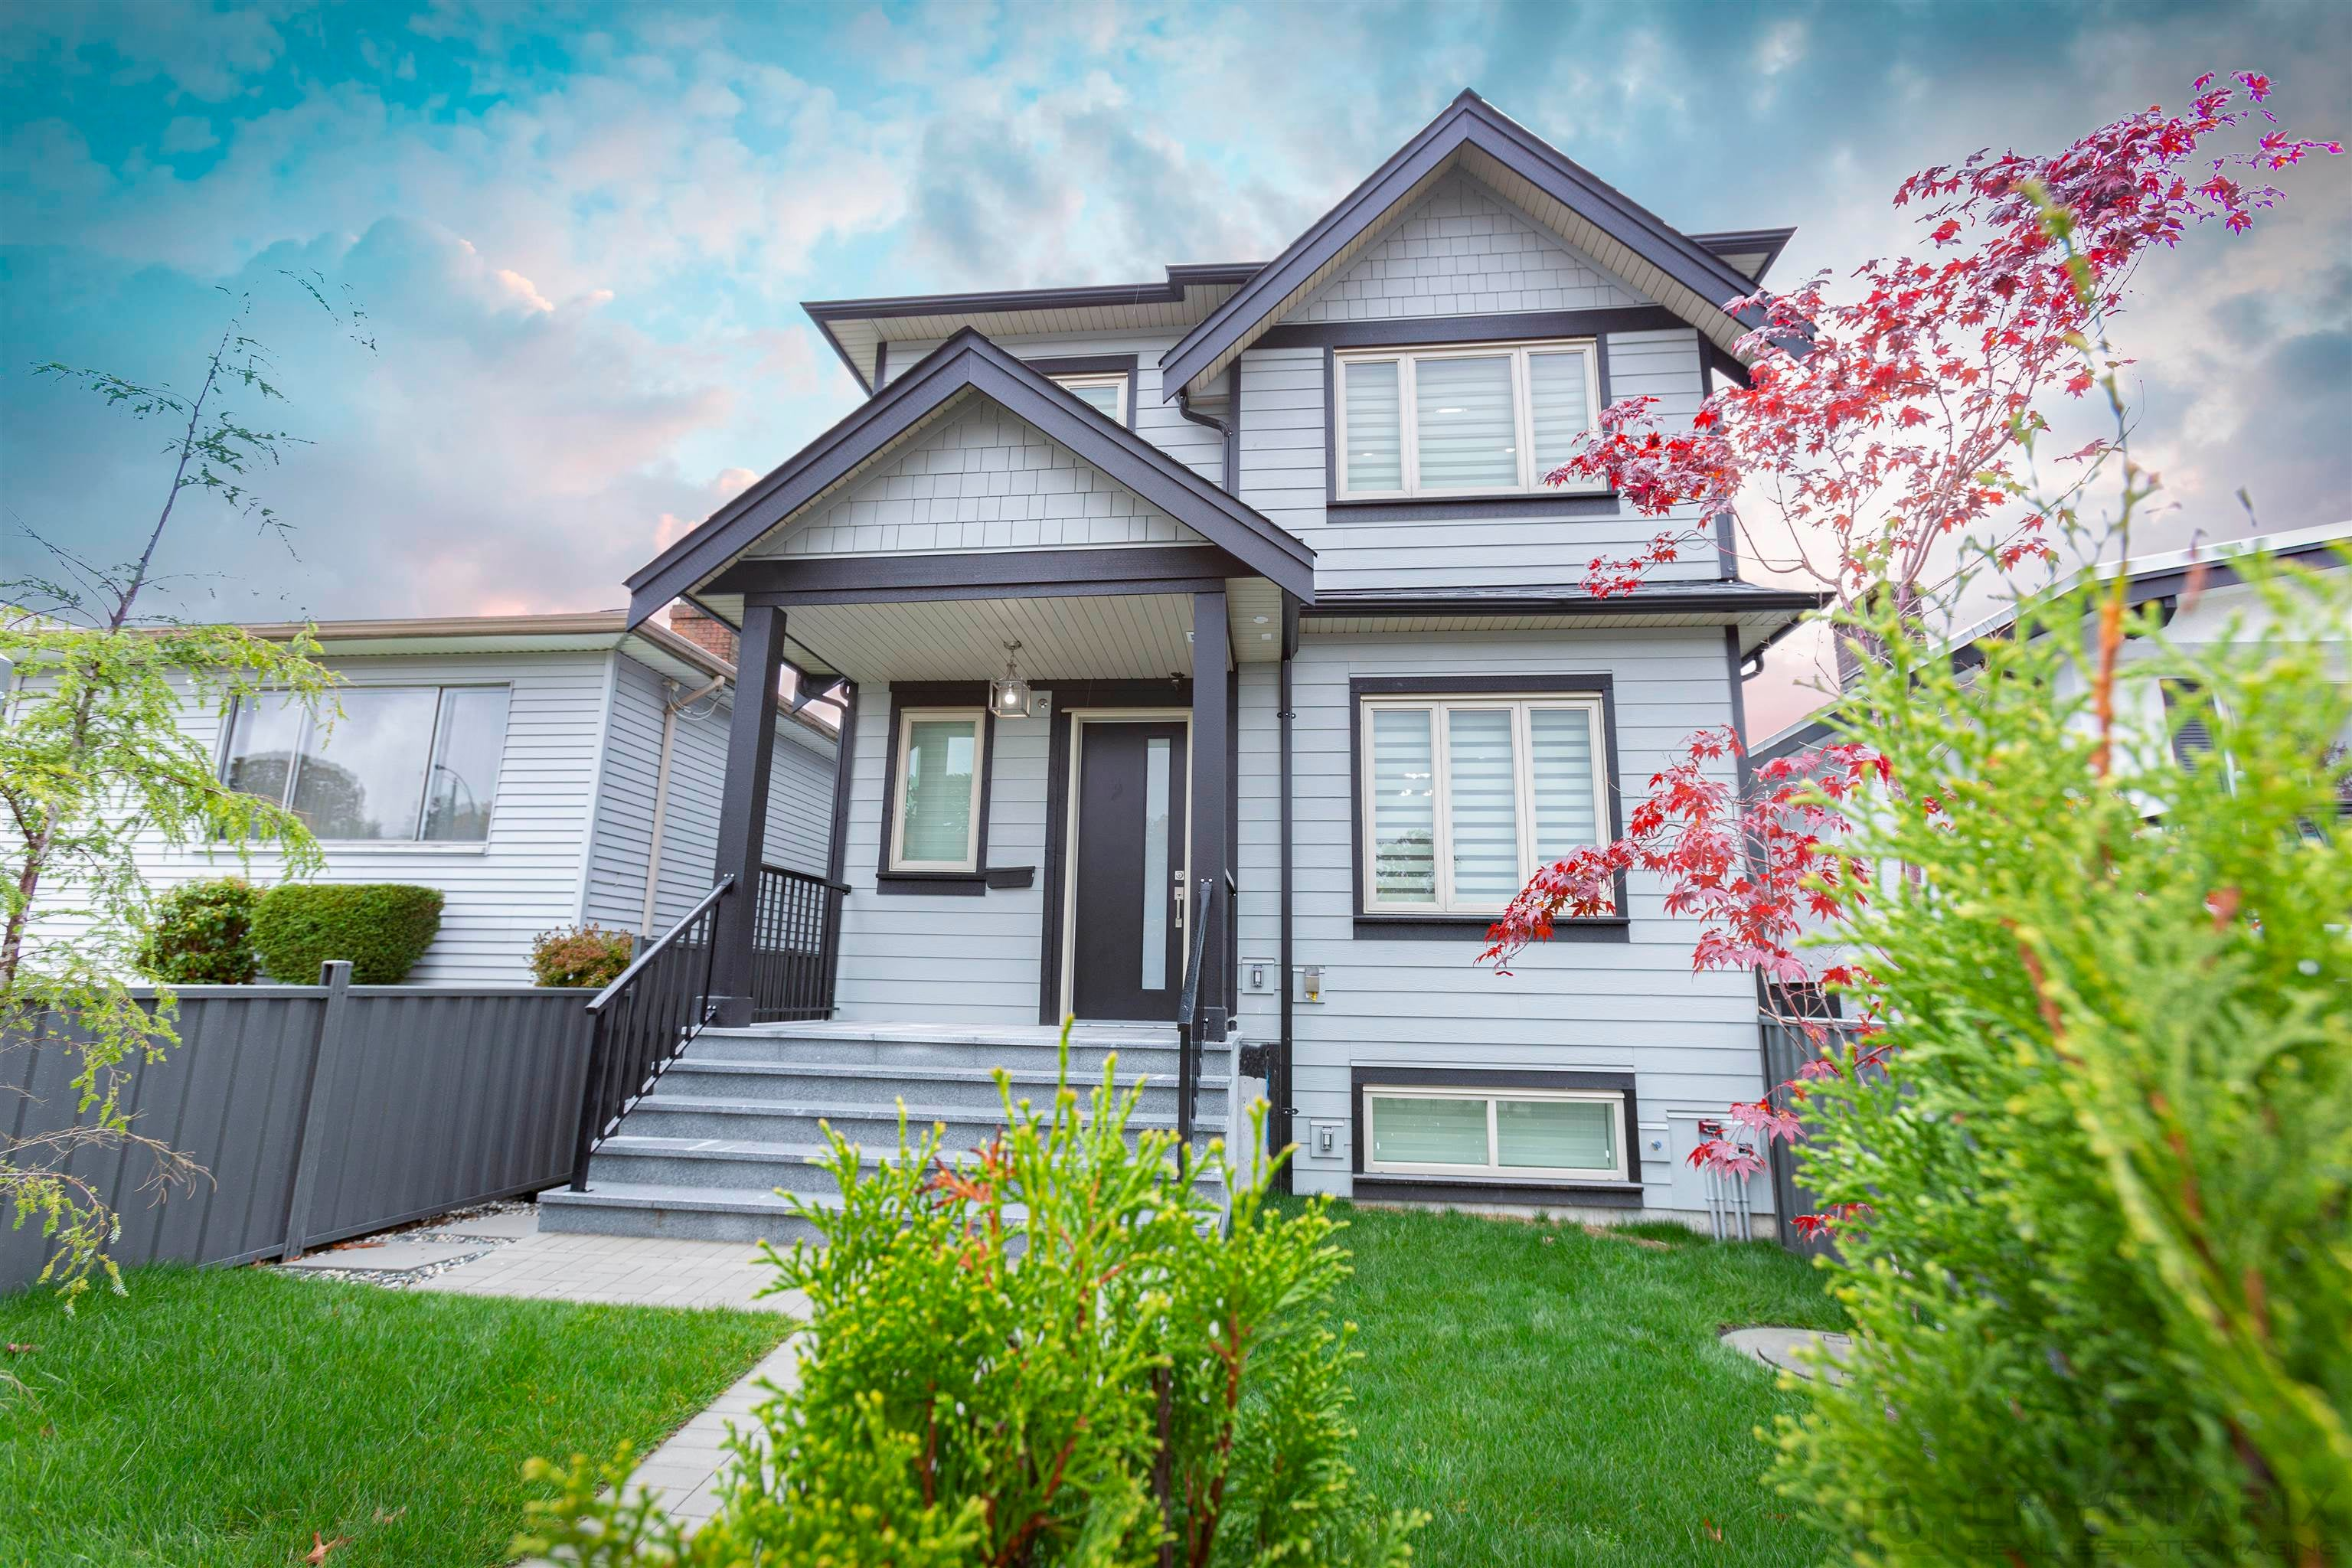 2887 MCGILL STREET - Hastings 1/2 Duplex for sale, 3 Bedrooms (R2627644) - #1